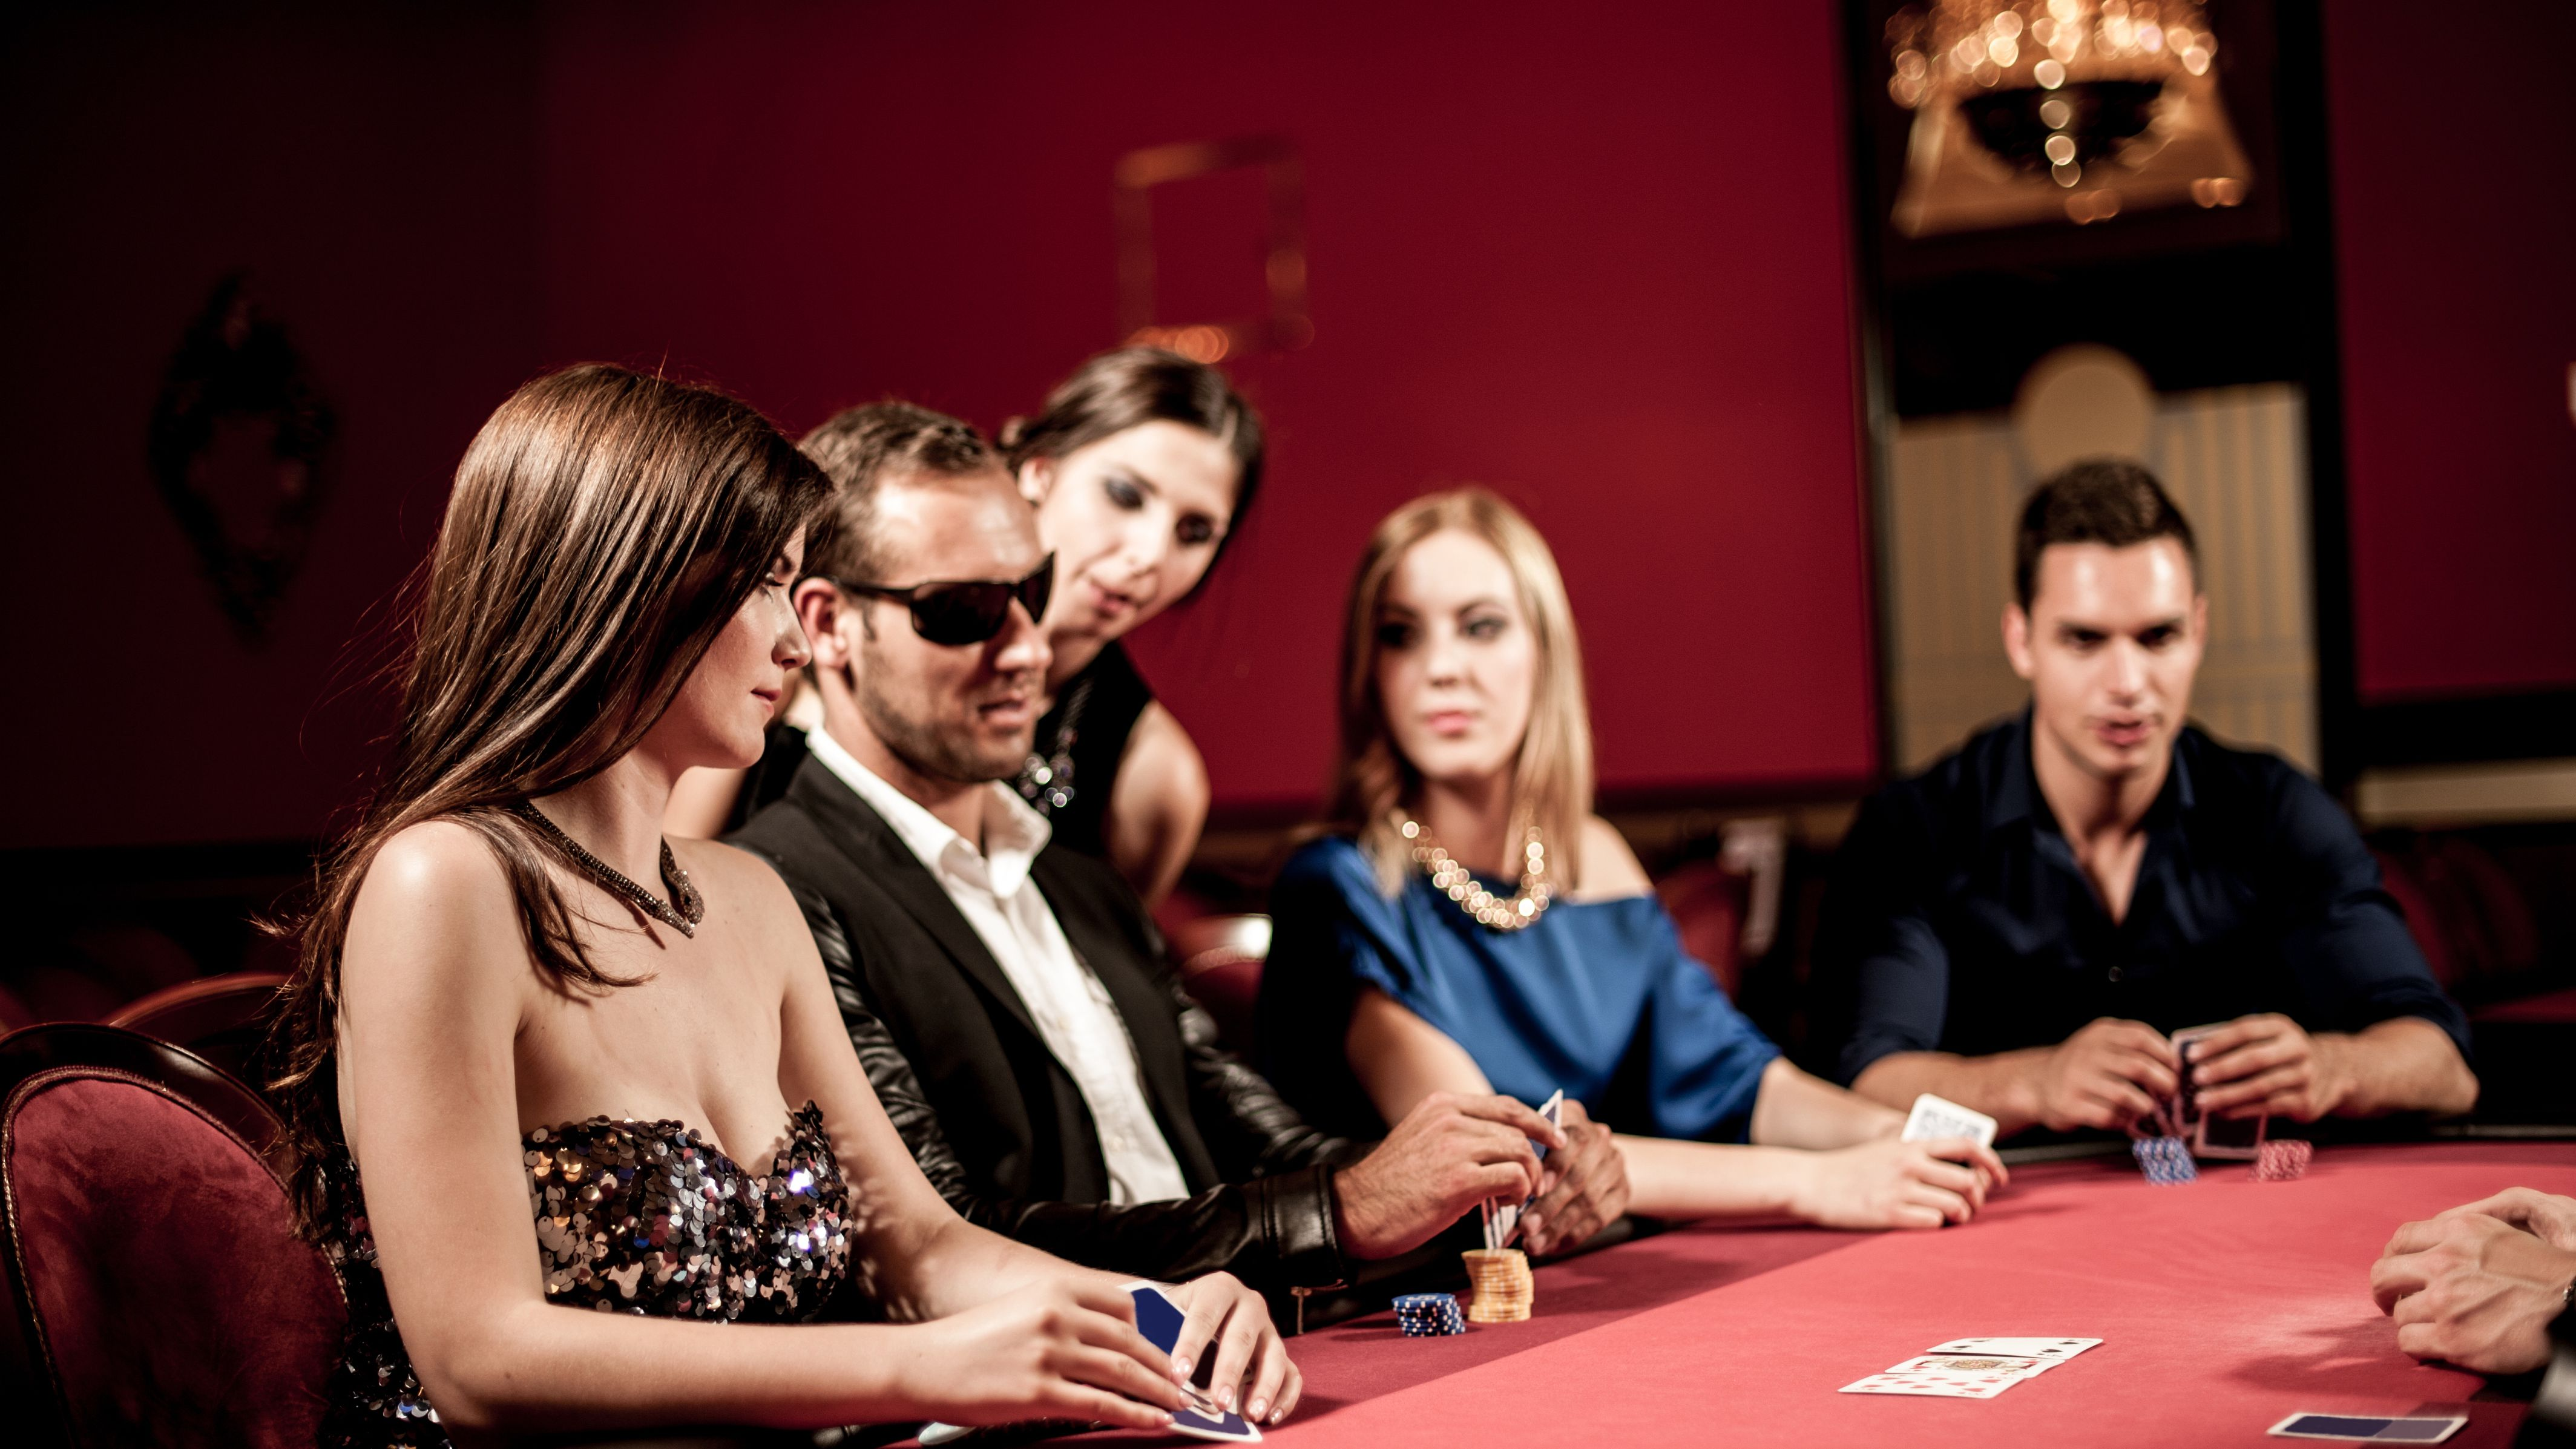 Empate a color poker